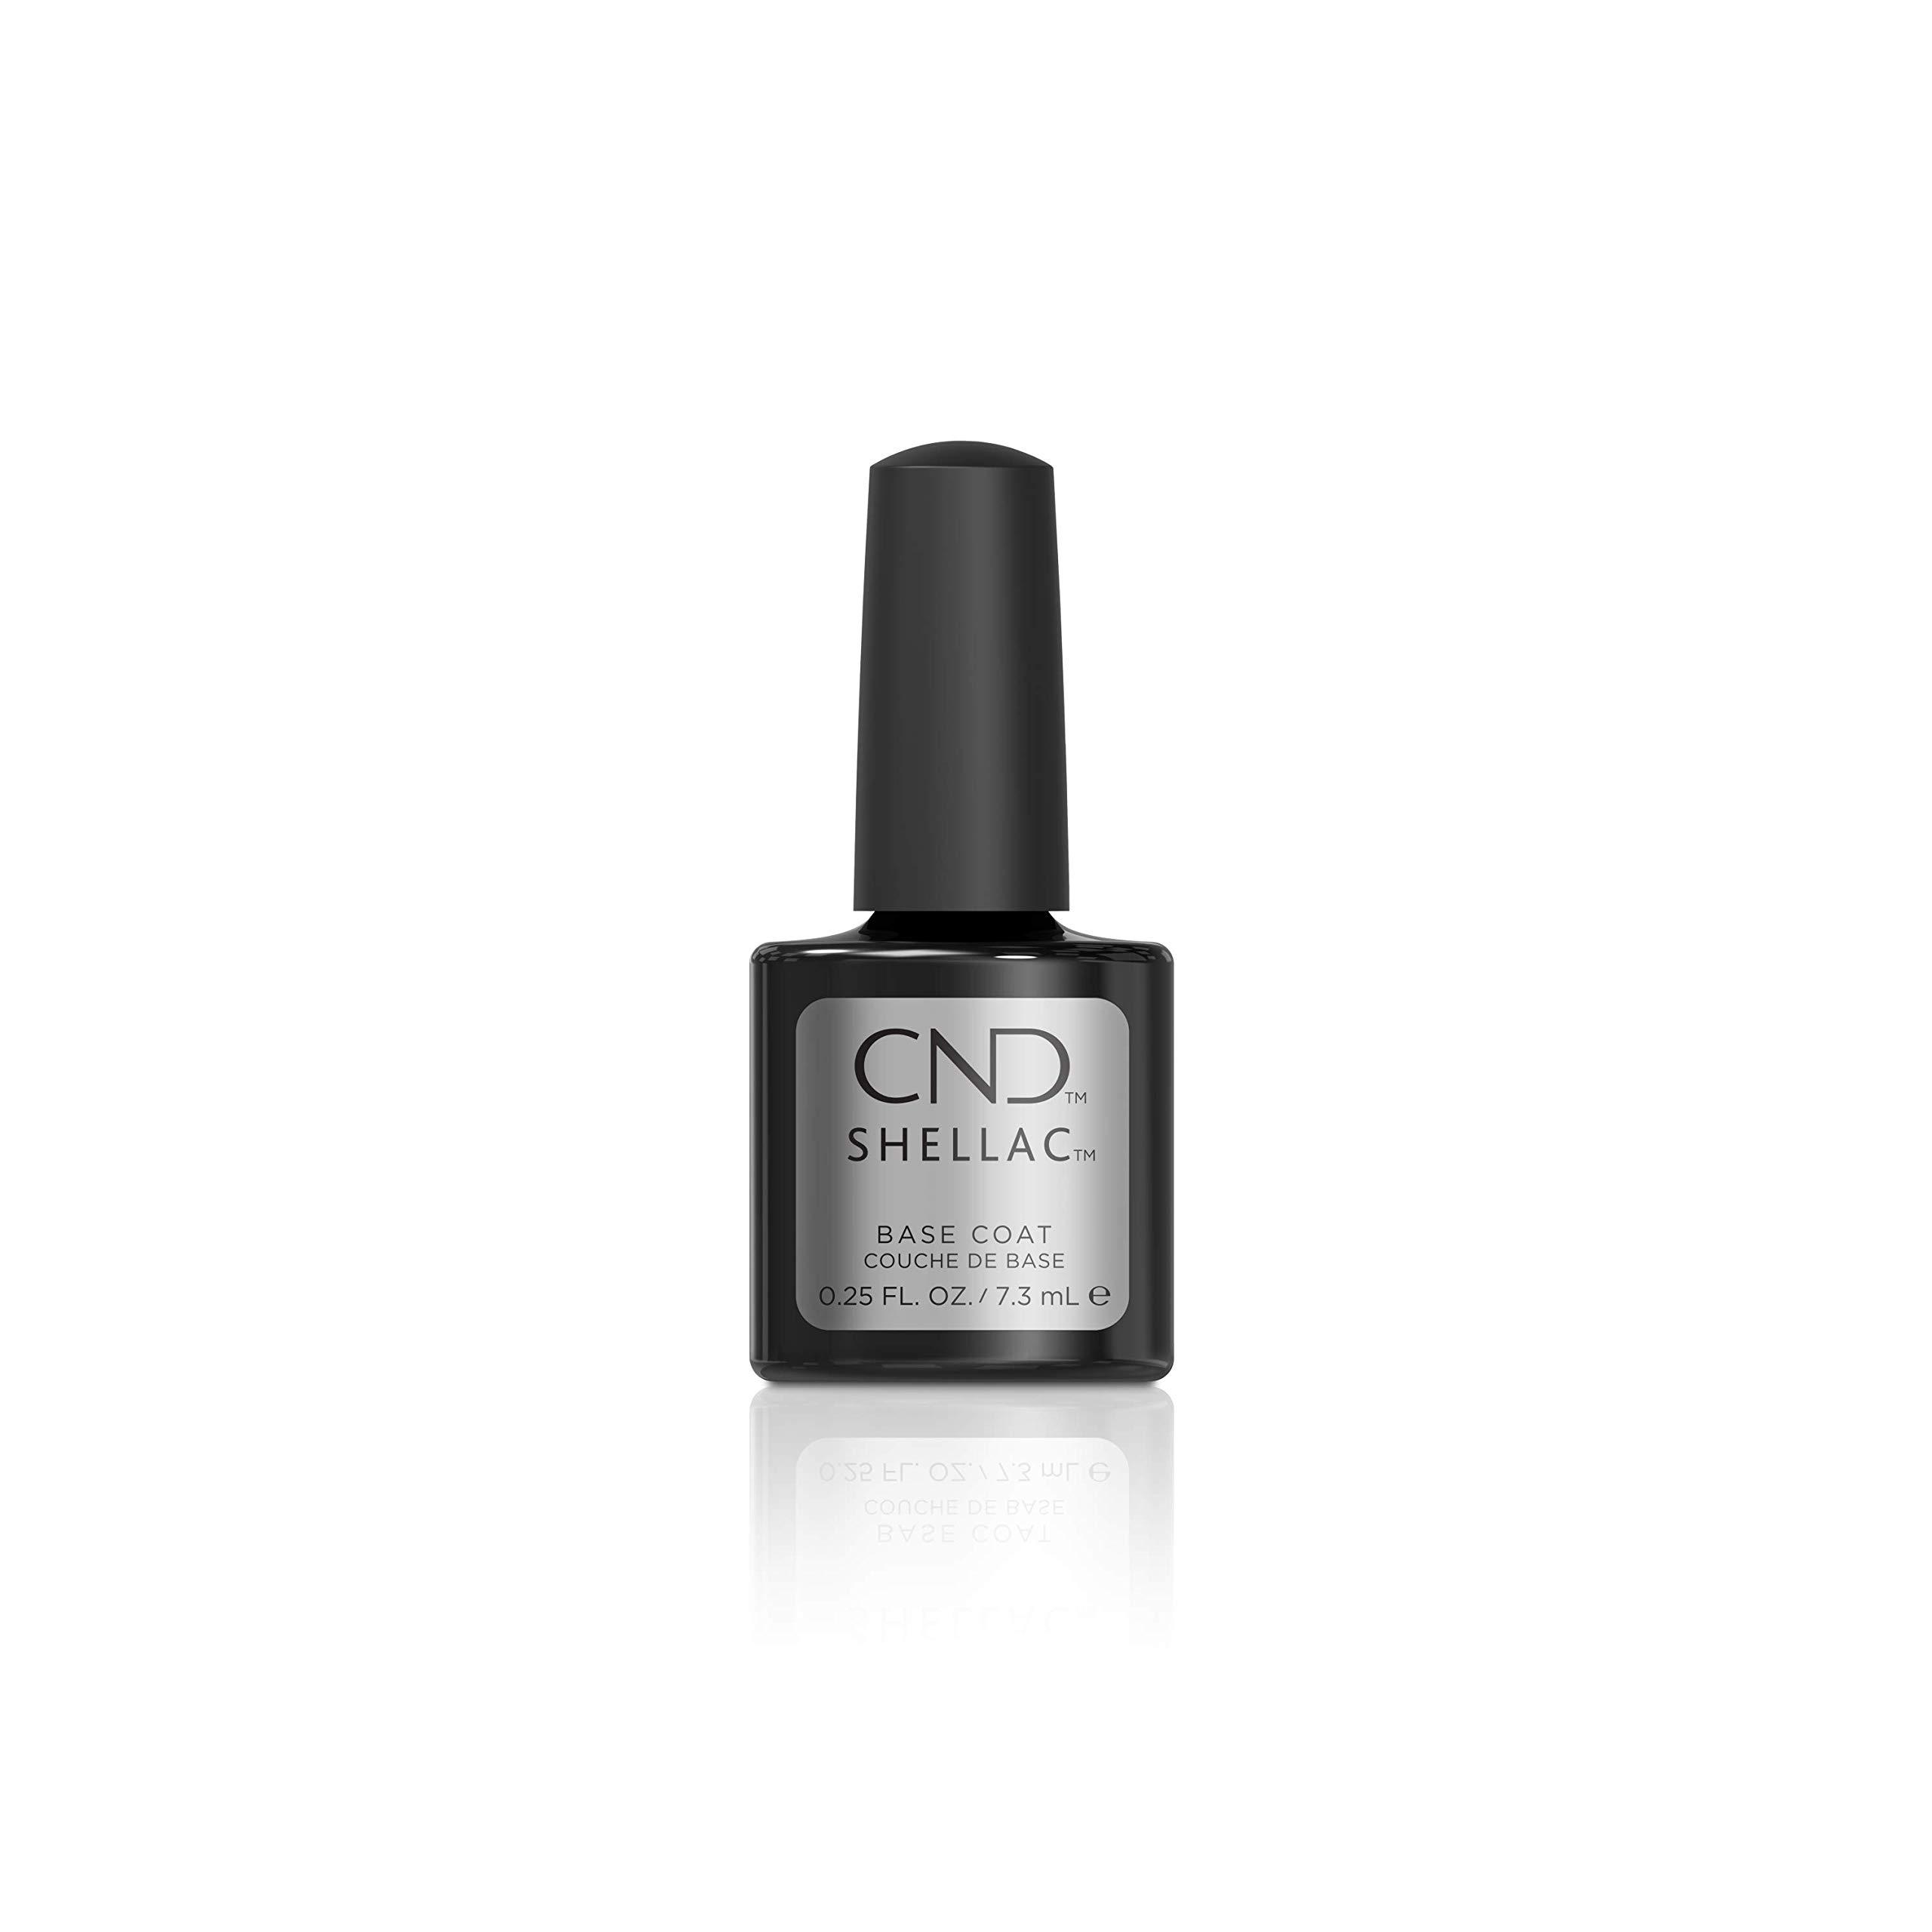 CND Shellac, Base Coat 7.3 ml